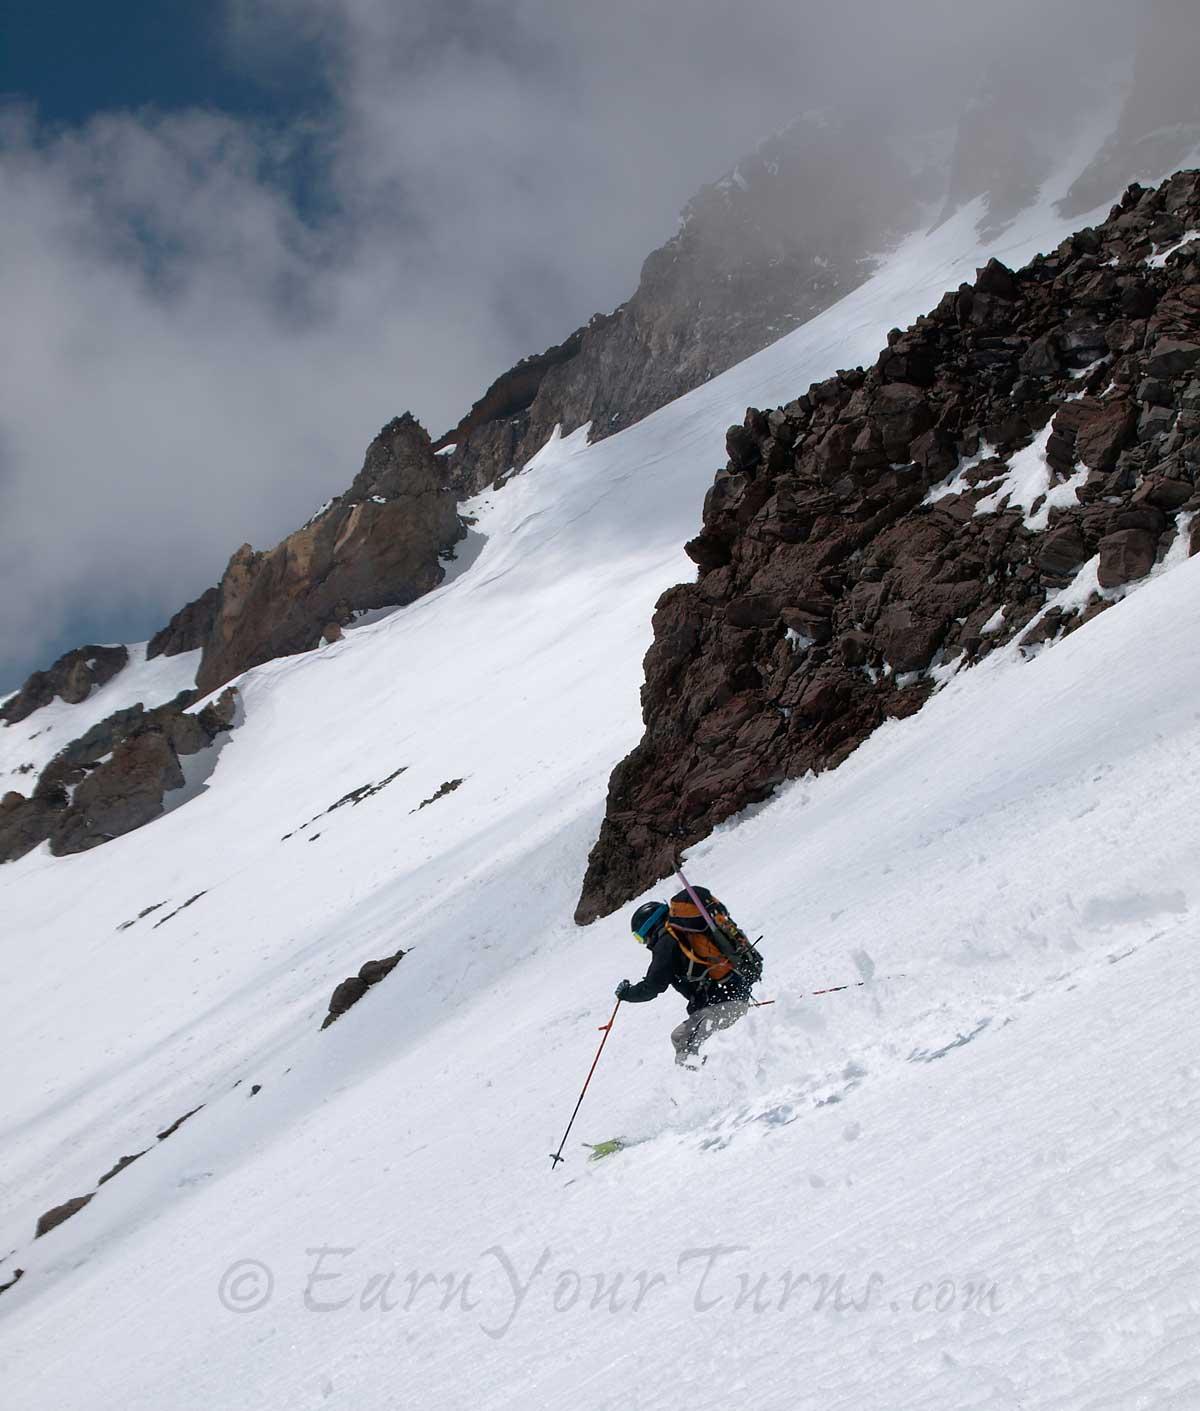 Skiing Avalanche Gulch mt Shasta tr Shasta Via Avalanche Gulch